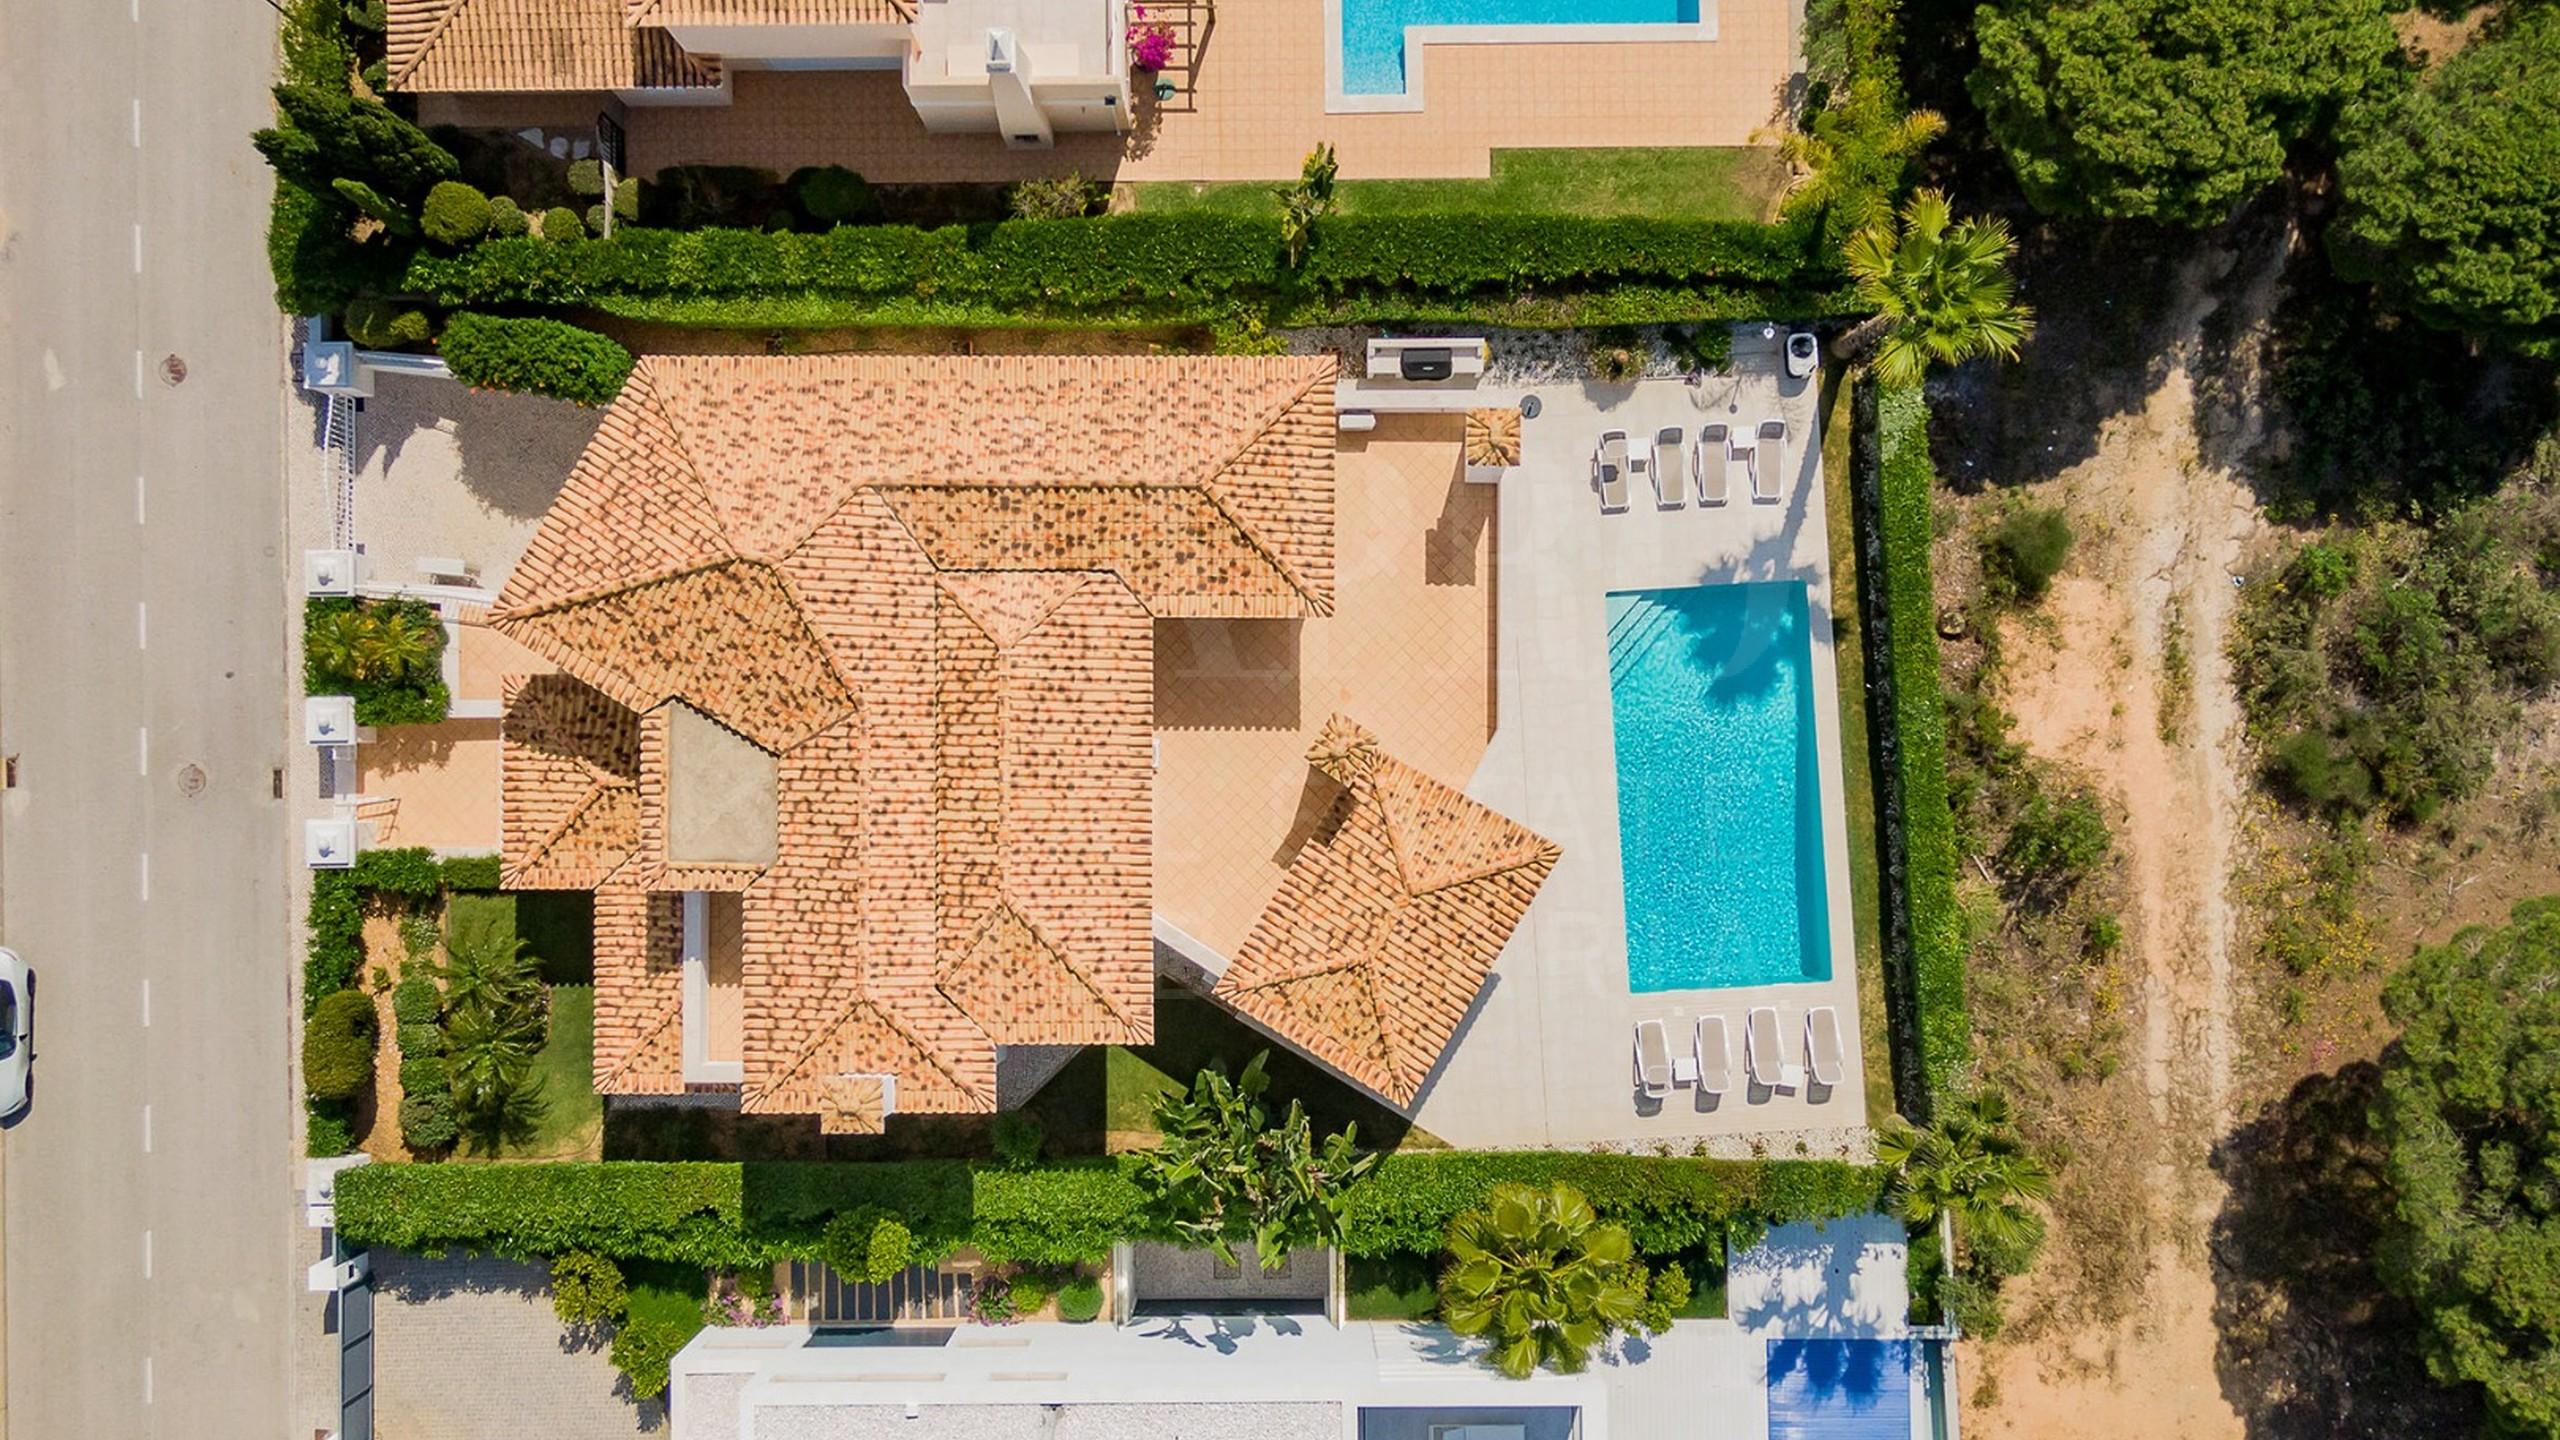 Vista aérea da casa